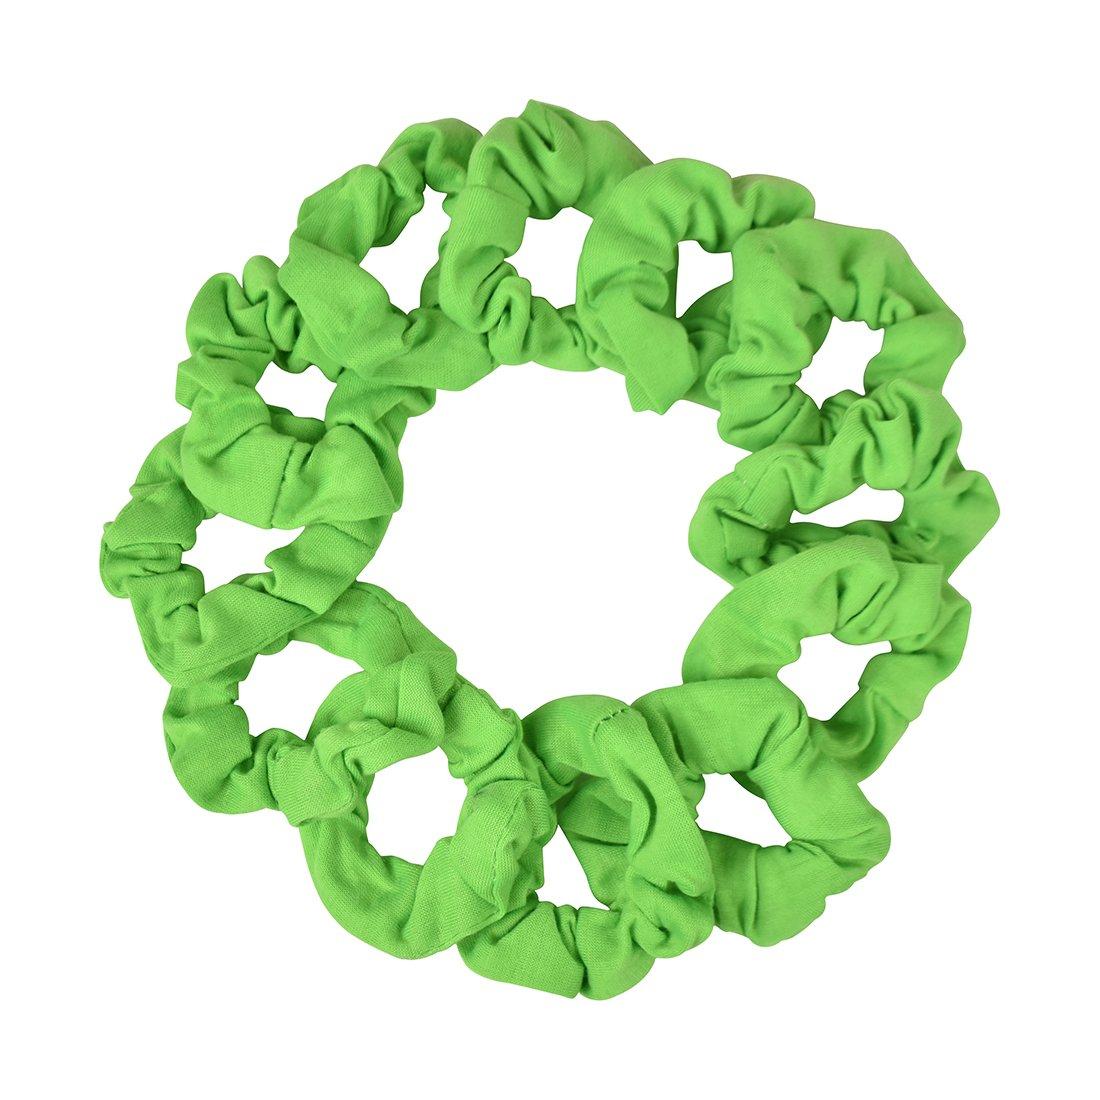 12 Pack Small Scrunchies Cotton Hair Scrunchy - White Motique Accessories 12PH0046WT